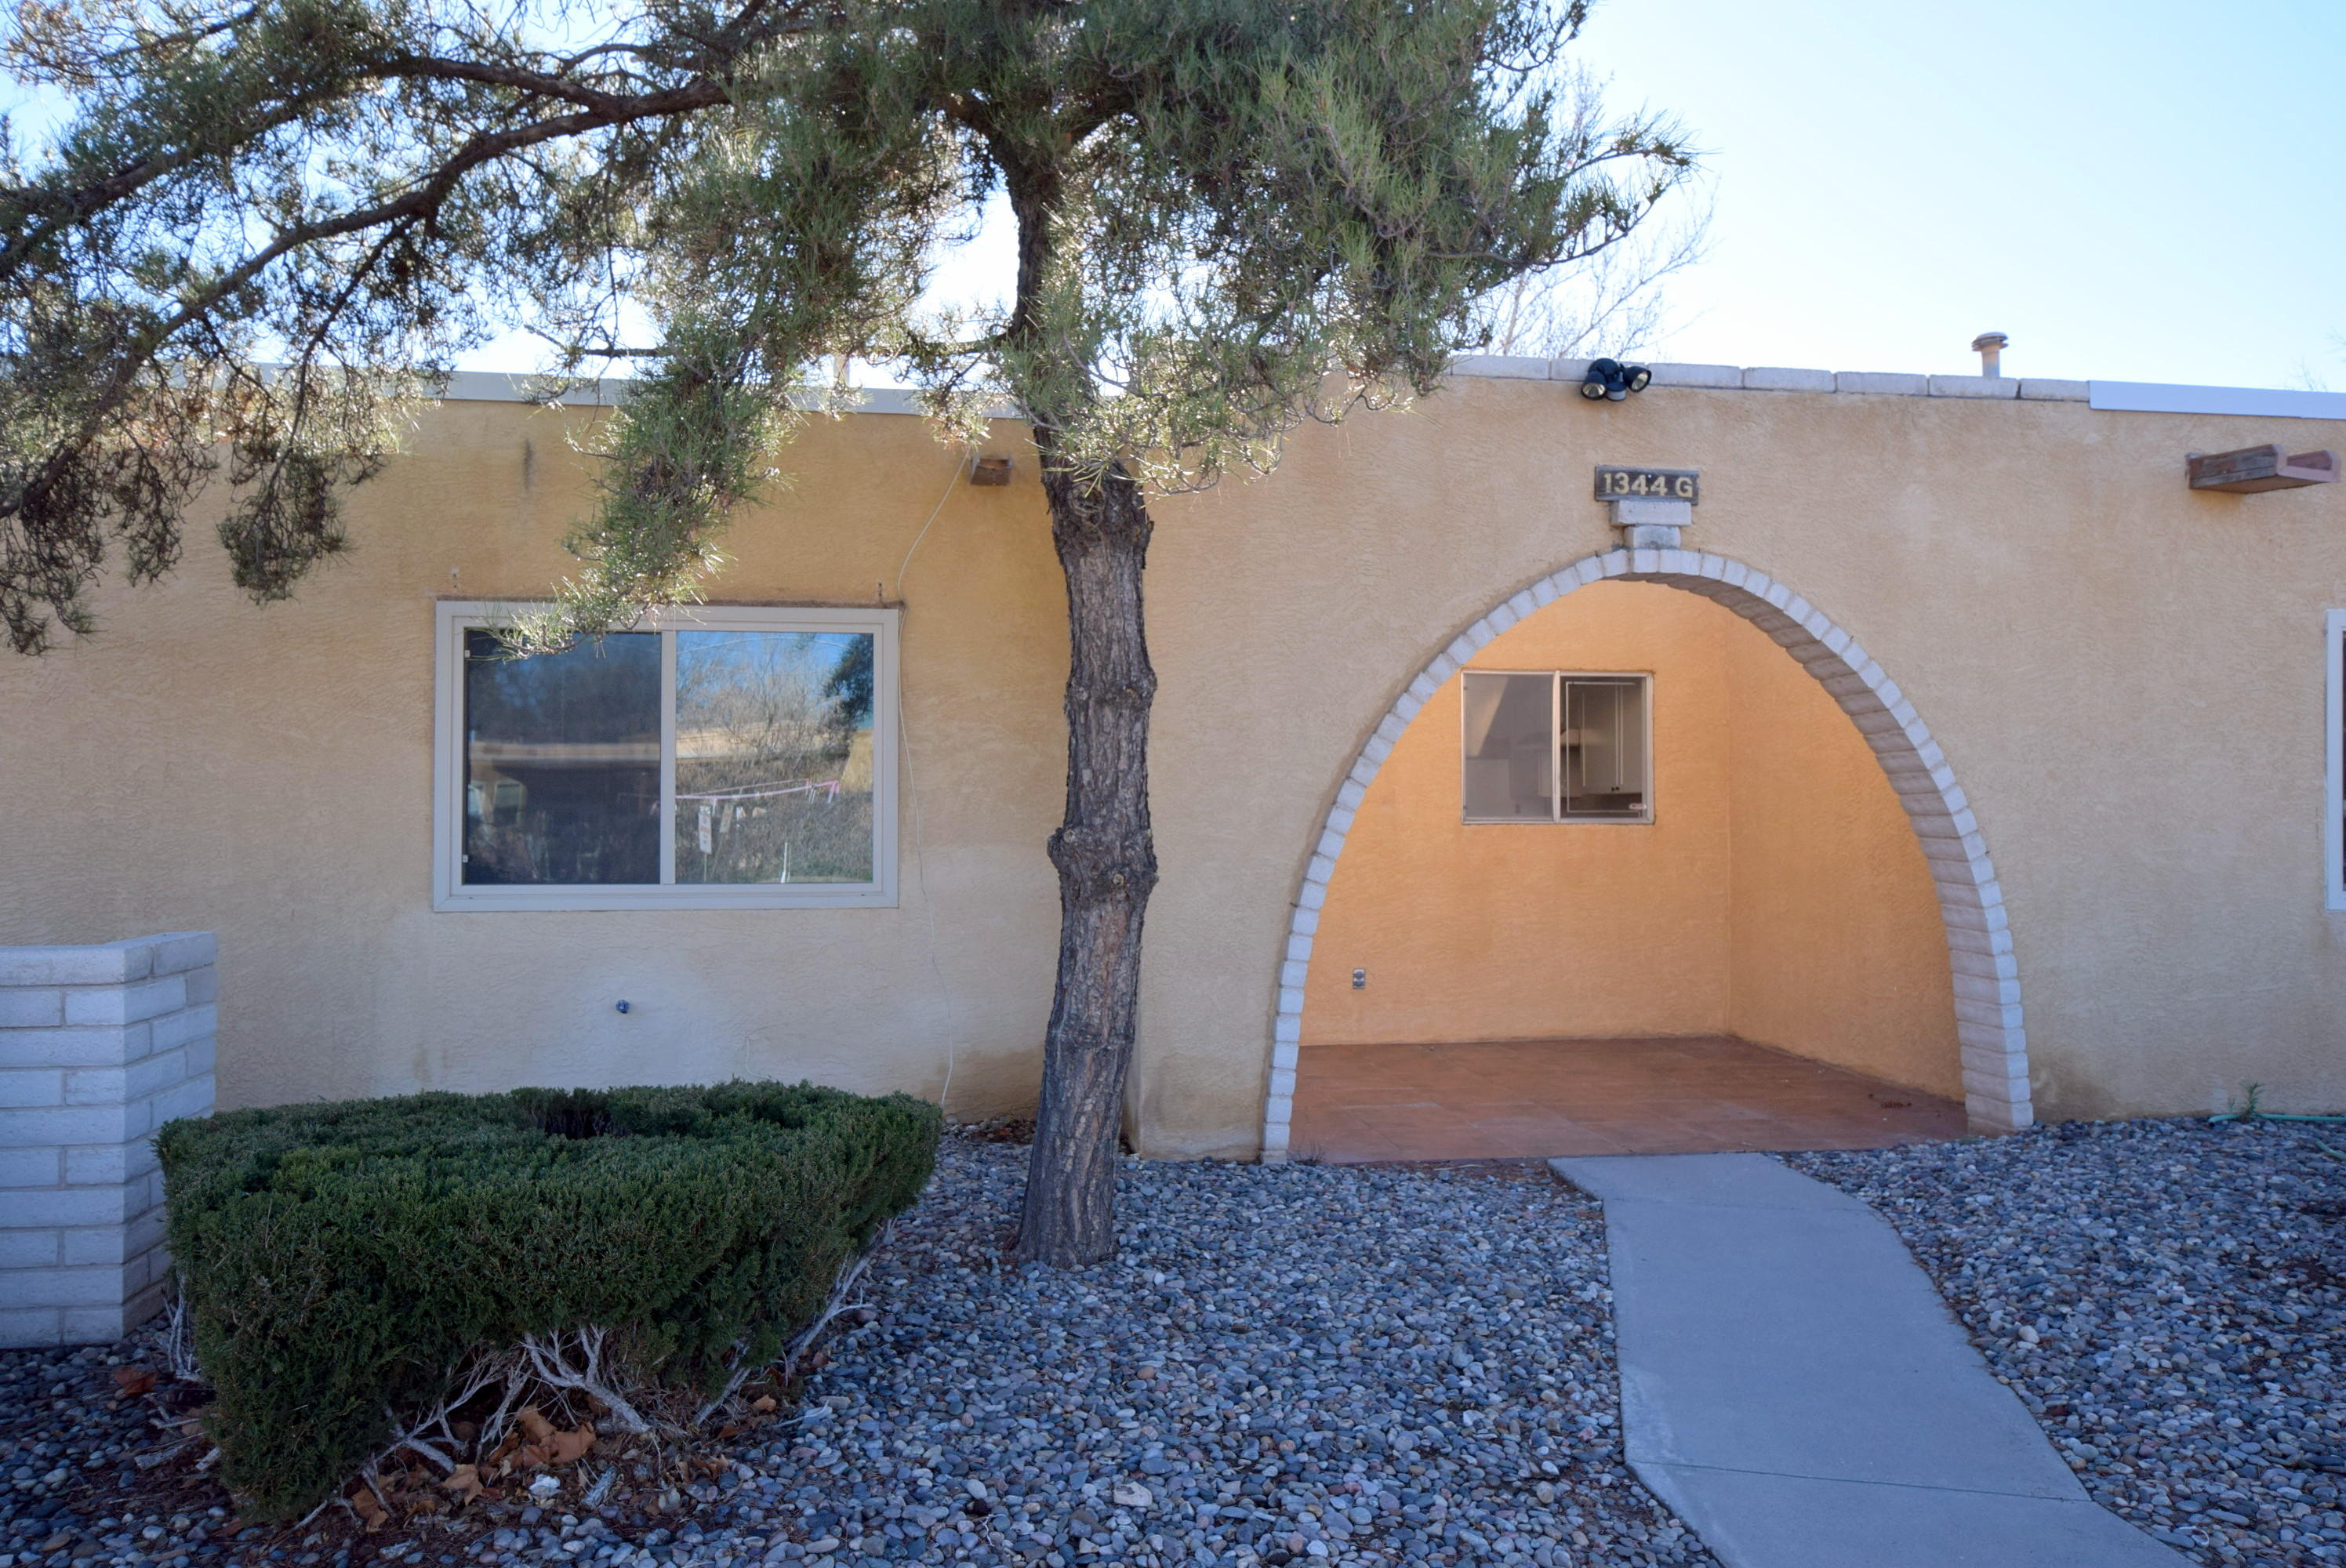 1344 Grande Boulevard SE #G, Rio Rancho, NM 87124 - Rio Rancho, NM real estate listing